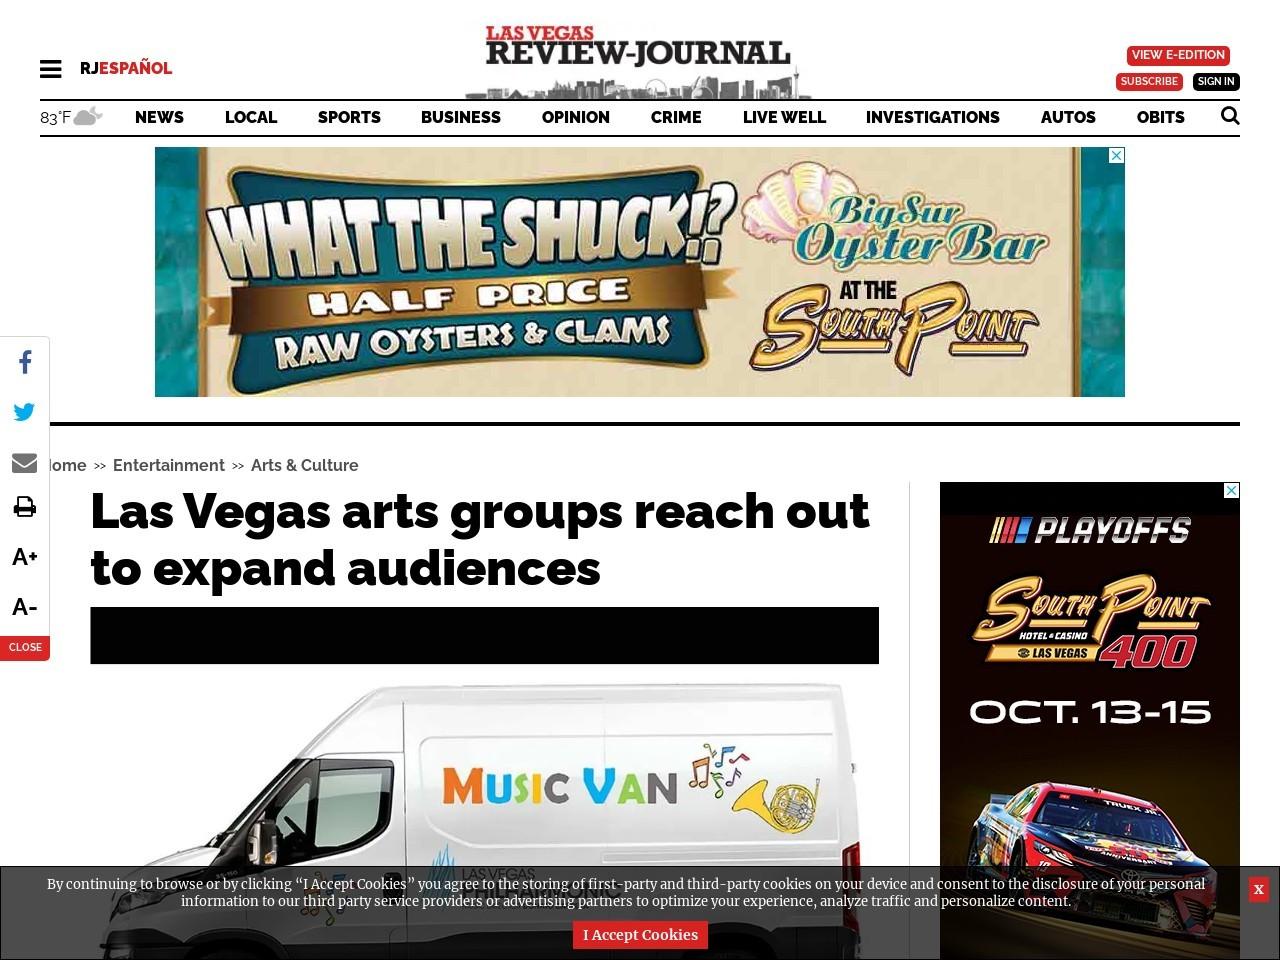 Las Vegas arts groups reach out to expand audiences